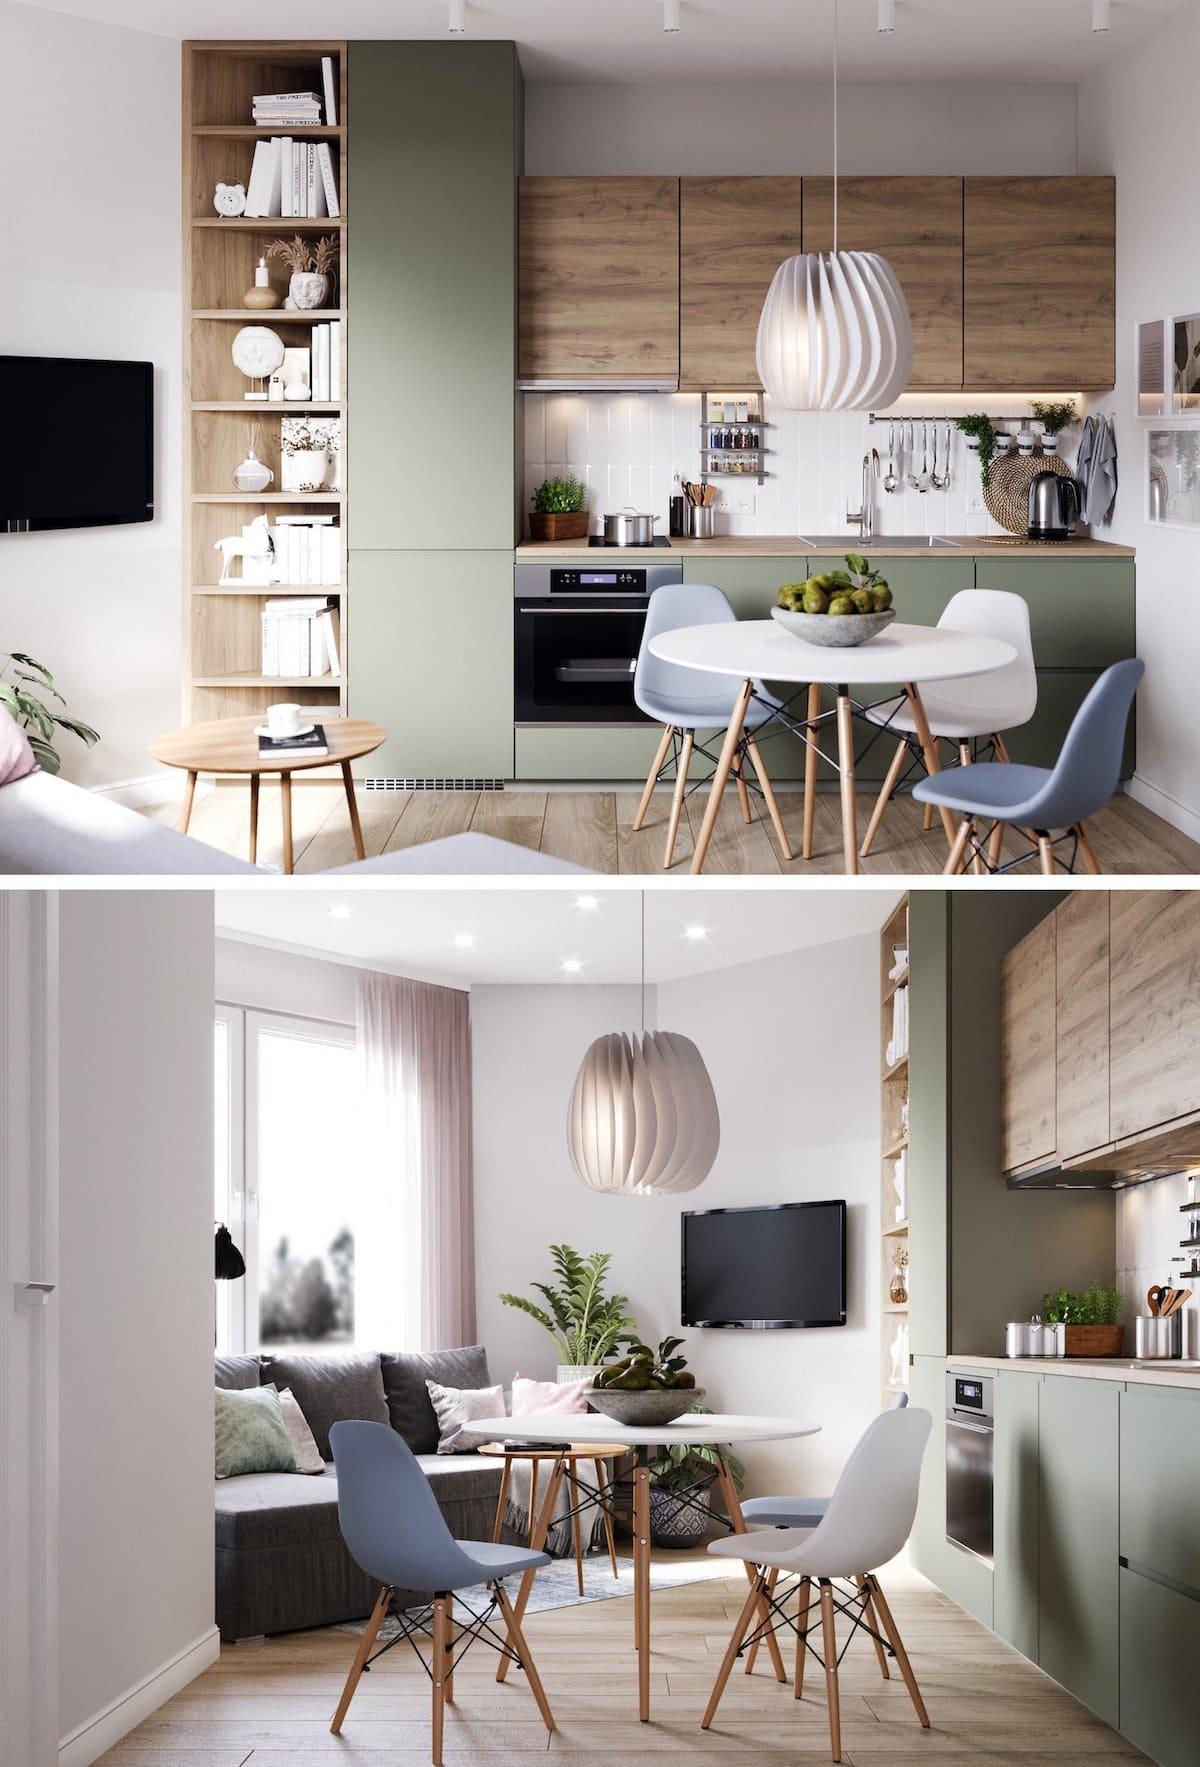 модный дизайн интерьера квартиры фото 58